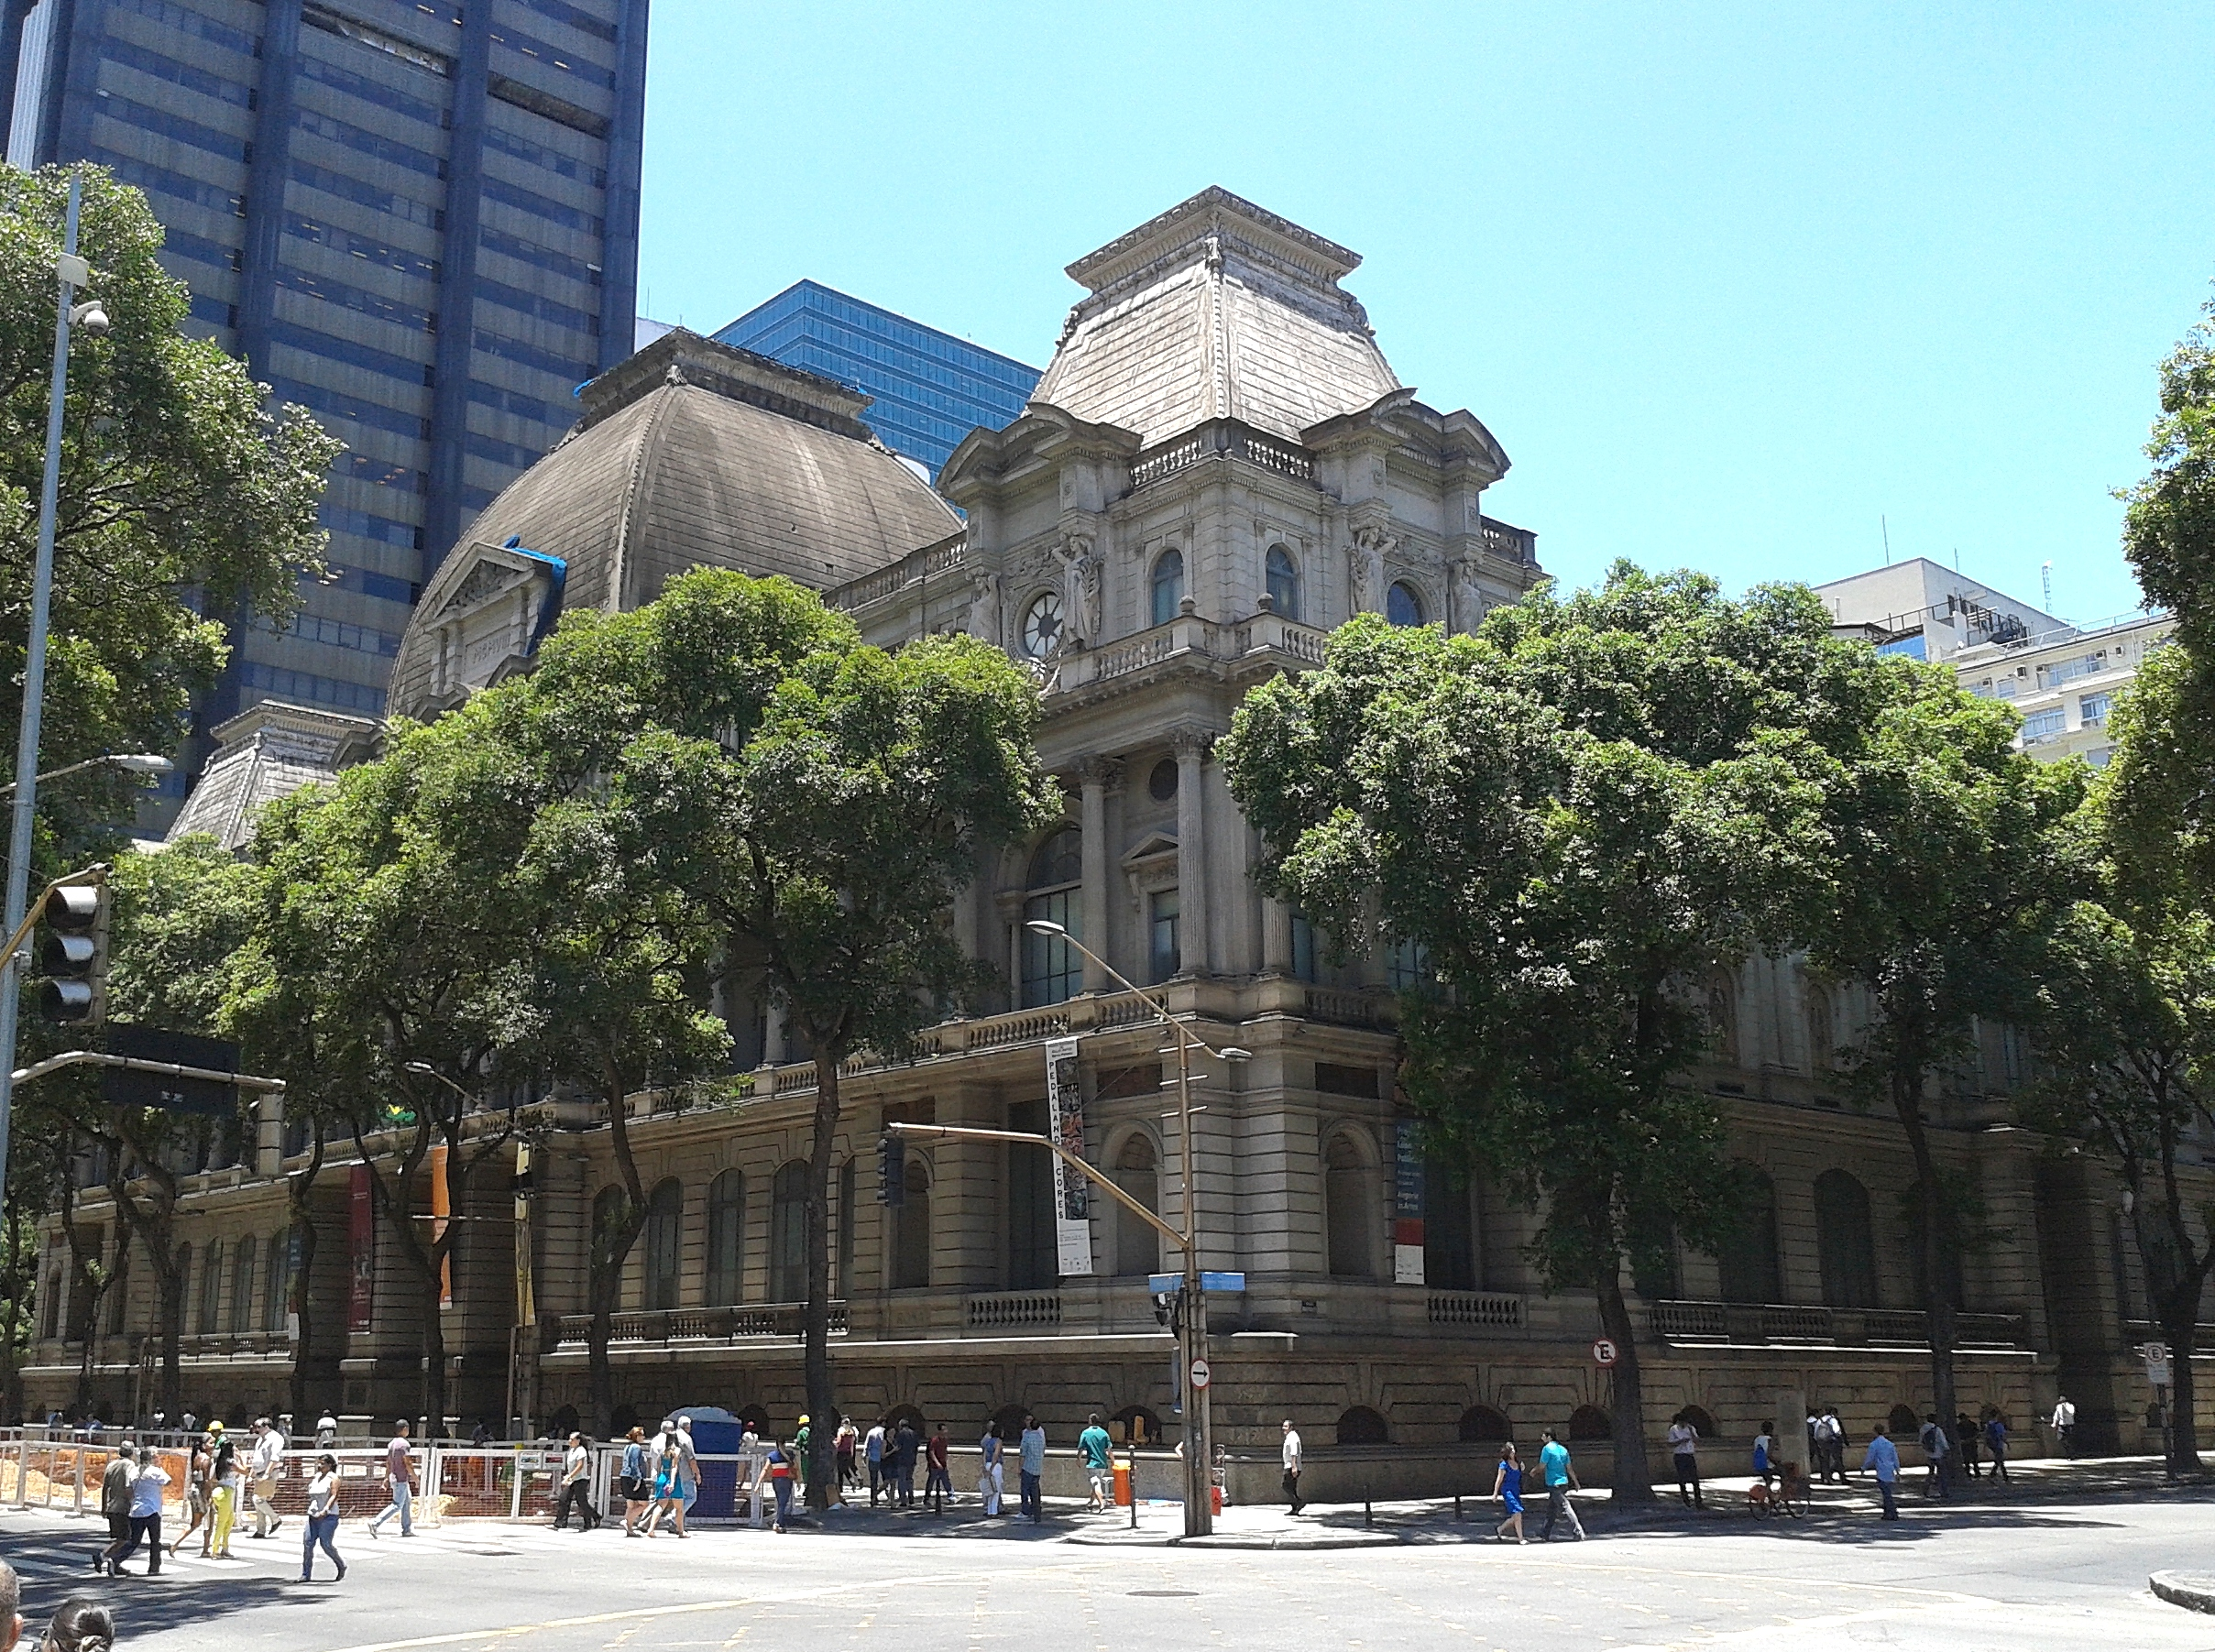 Fachada principal do edifício onde funciona o Museu Nacional de Belas Artes do Rio de Janeiro.